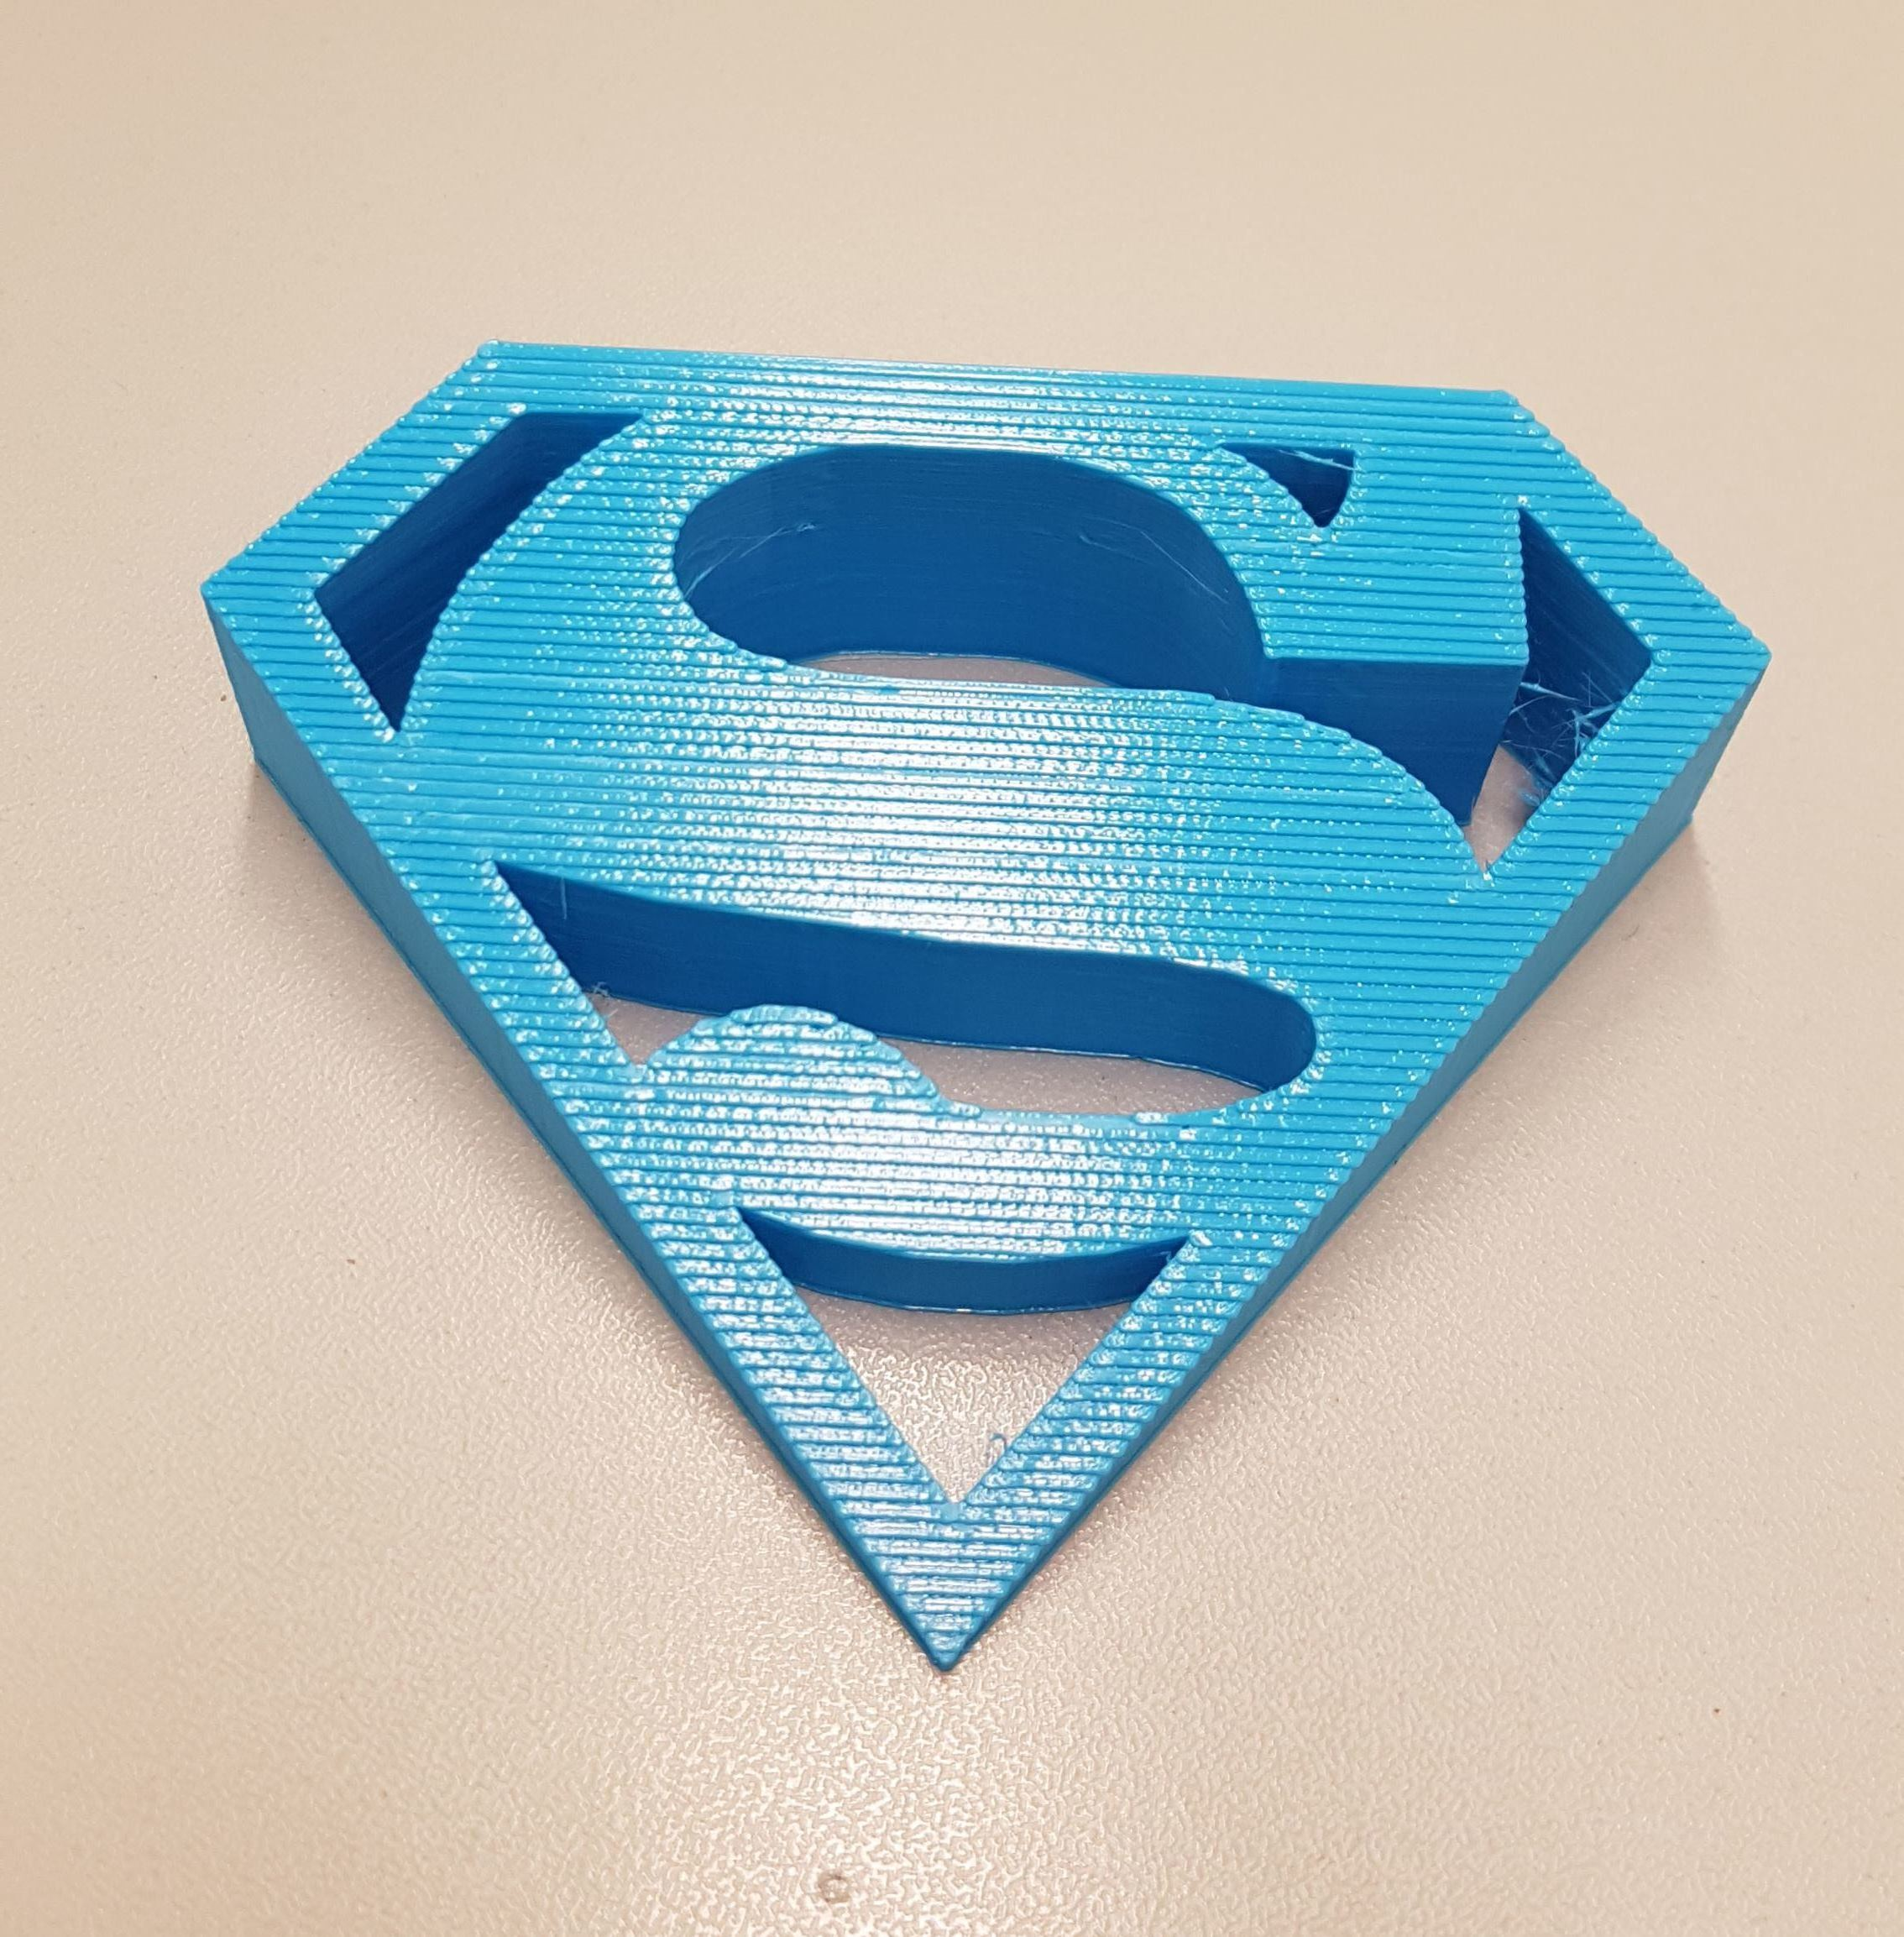 superman.jpeg Download STL file SUPERMAN door stopper • 3D print model, JOYs-3D